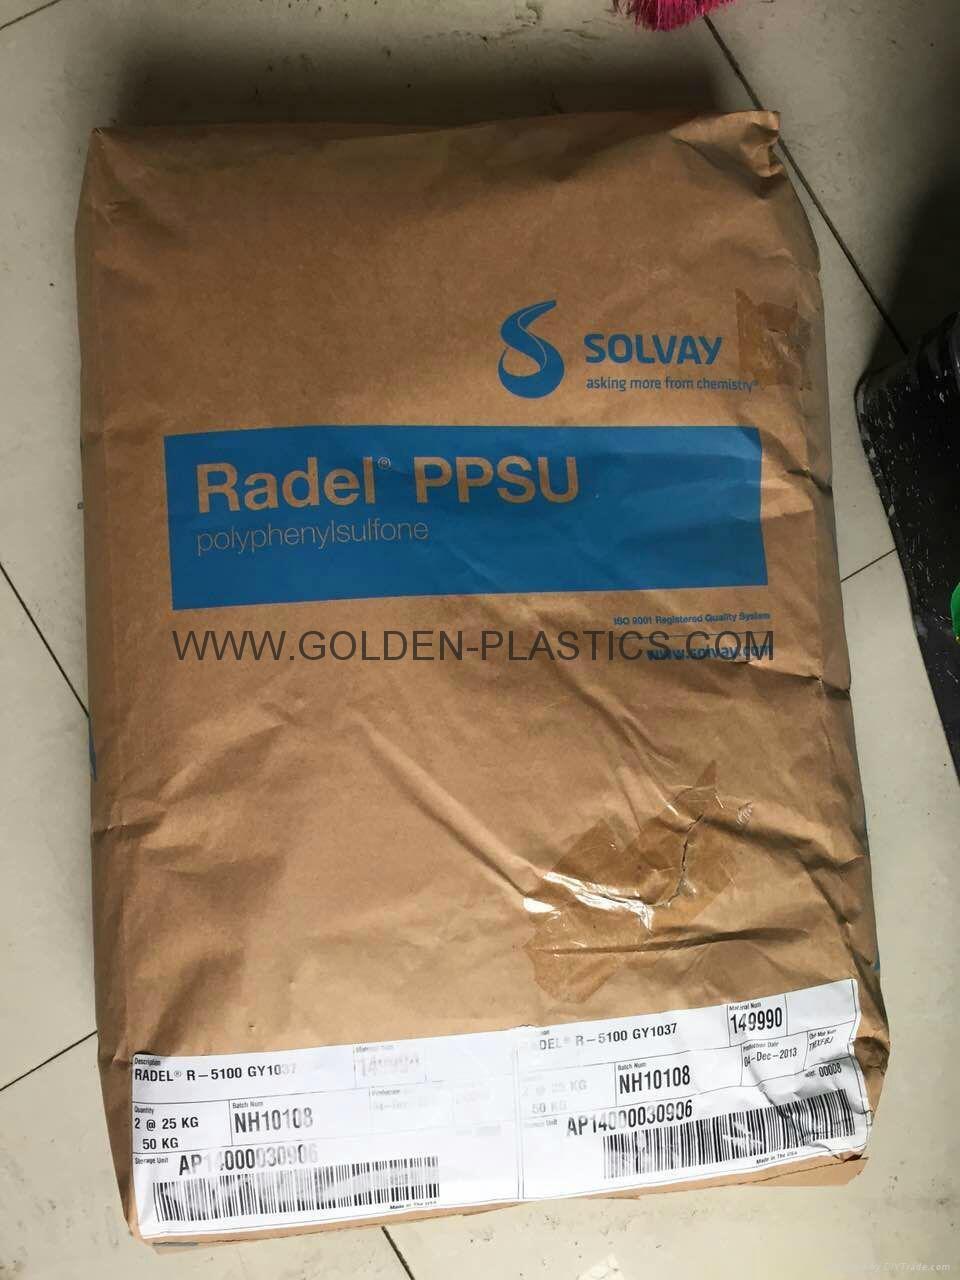 PPSU Radel R-5100